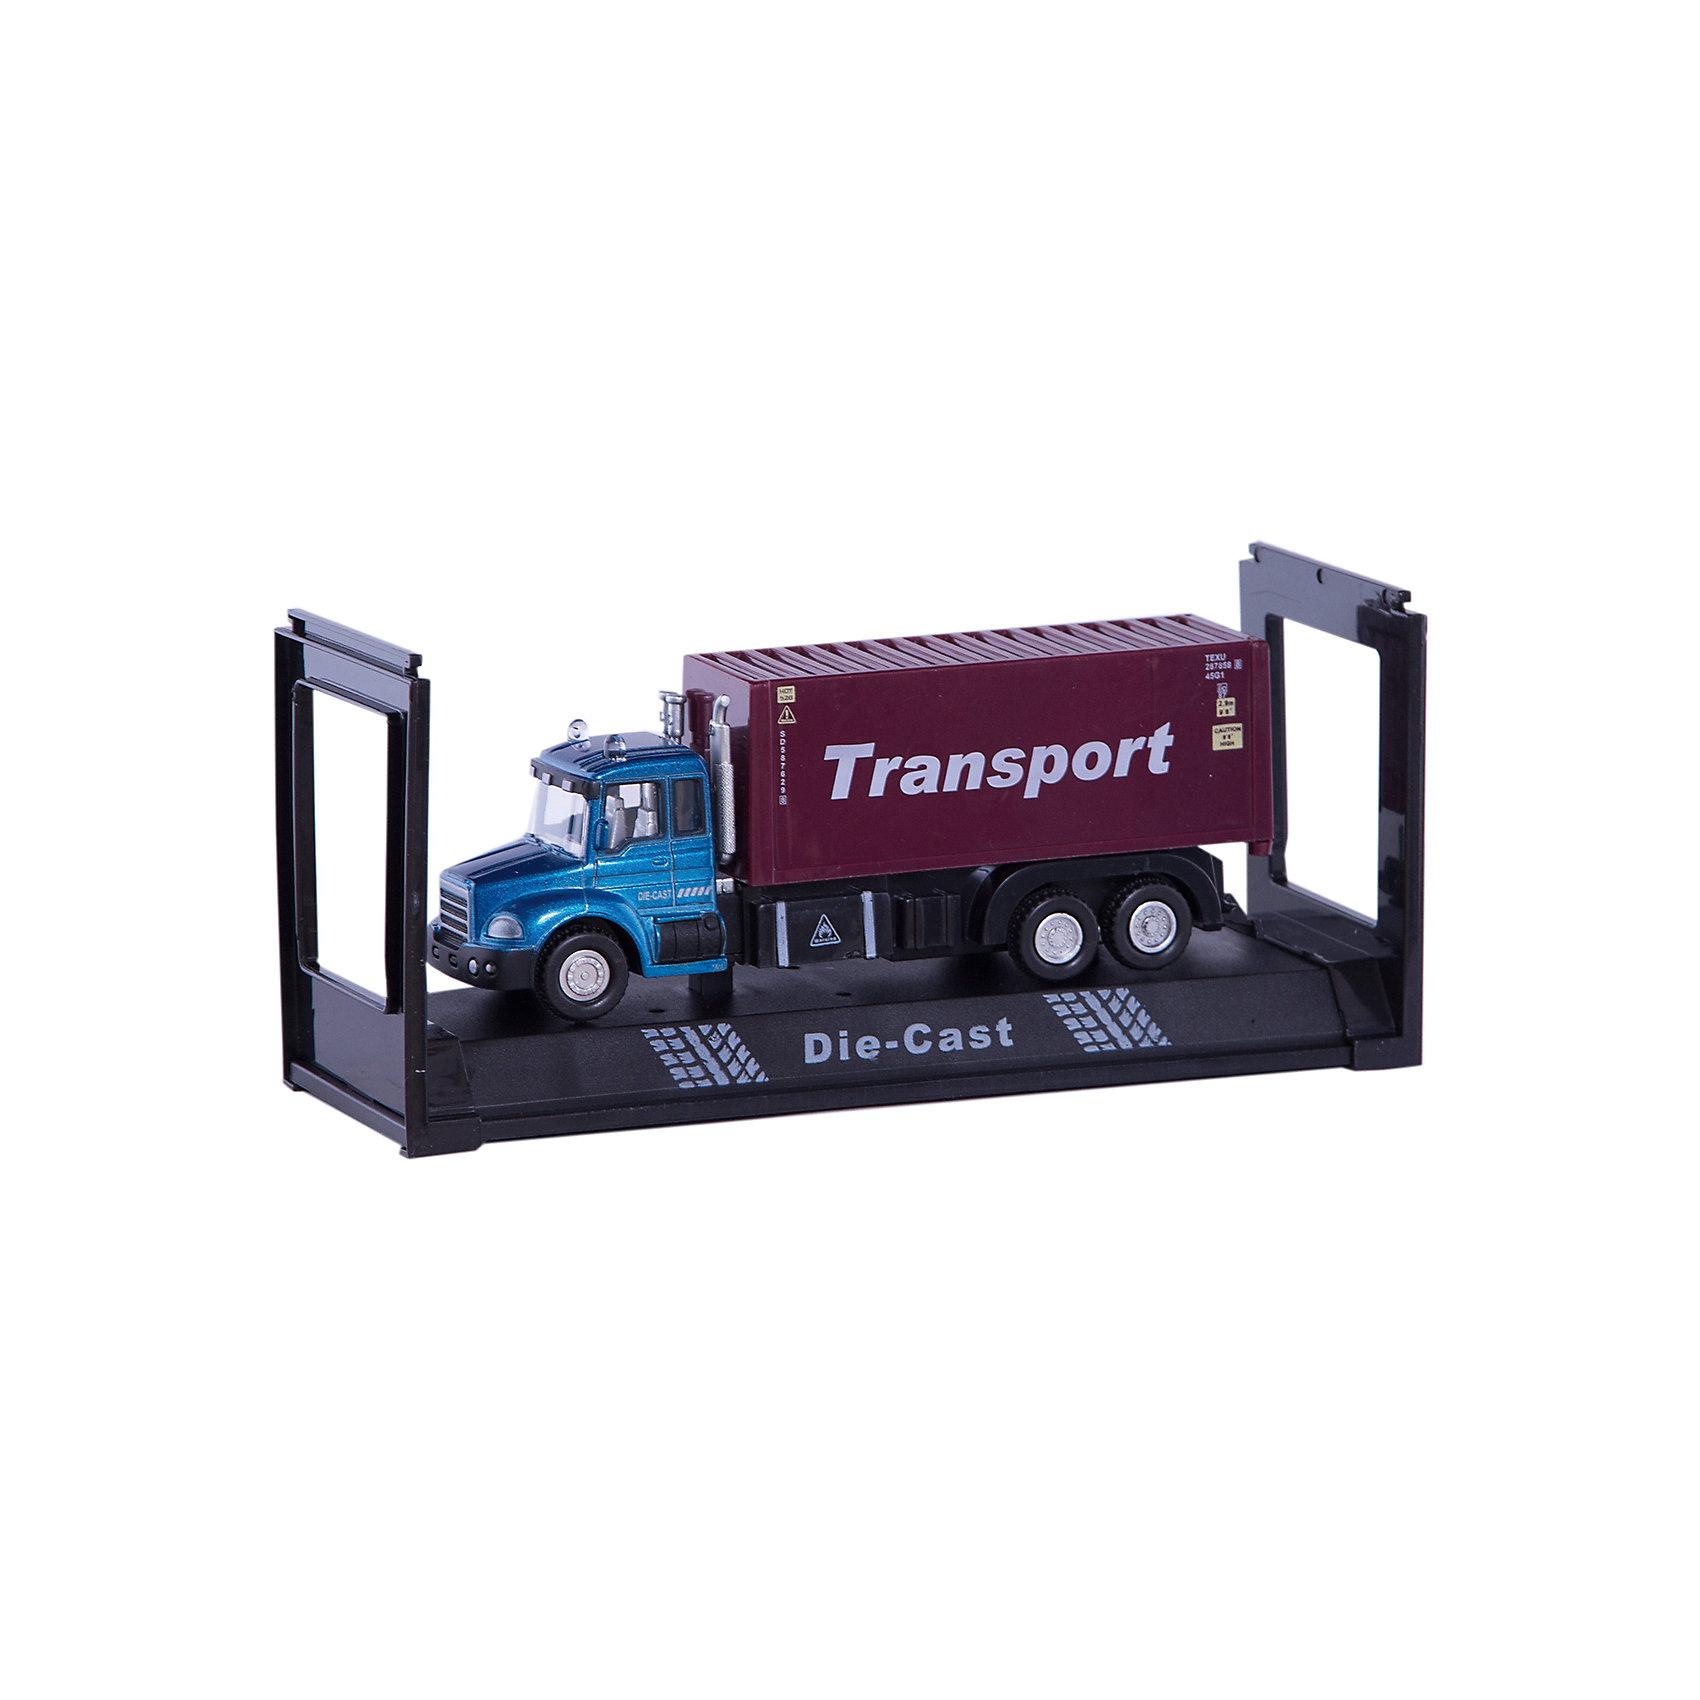 Машинка Transport Truck контейнеровоз 1:48, AutotimeМашинки<br><br><br>Ширина мм: 165<br>Глубина мм: 57<br>Высота мм: 75<br>Вес г: 13<br>Возраст от месяцев: 36<br>Возраст до месяцев: 2147483647<br>Пол: Мужской<br>Возраст: Детский<br>SKU: 5584045